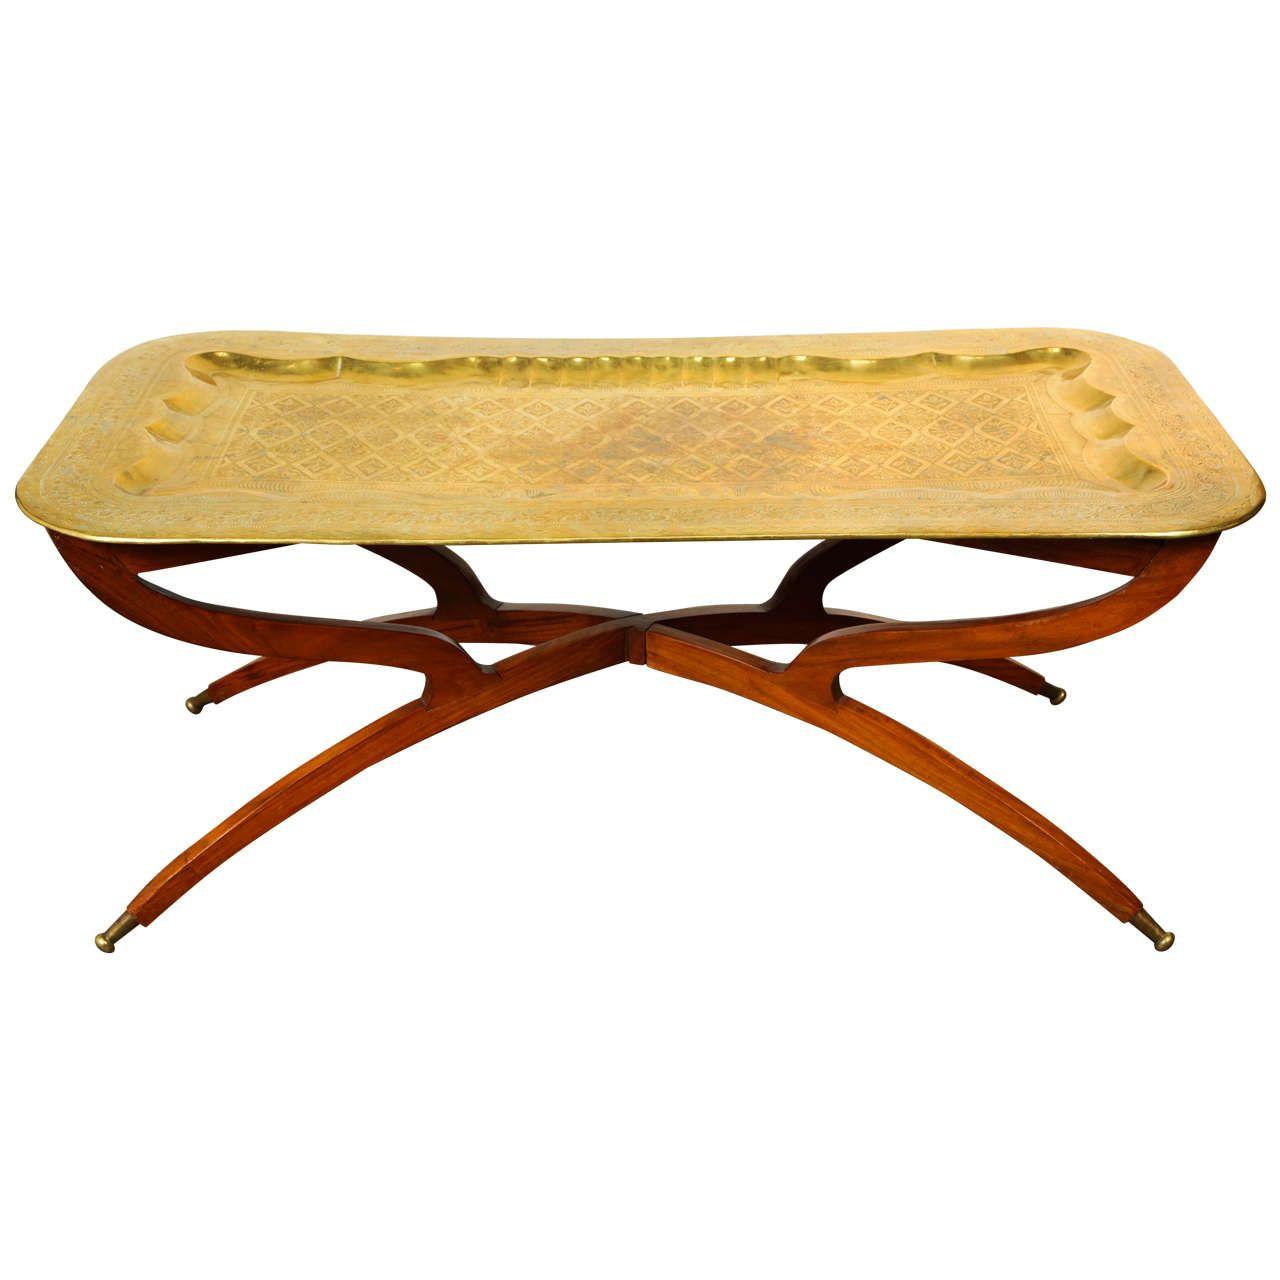 Moroccan Rectangular Brass Tray Coffee Table 1950 Brass Tray